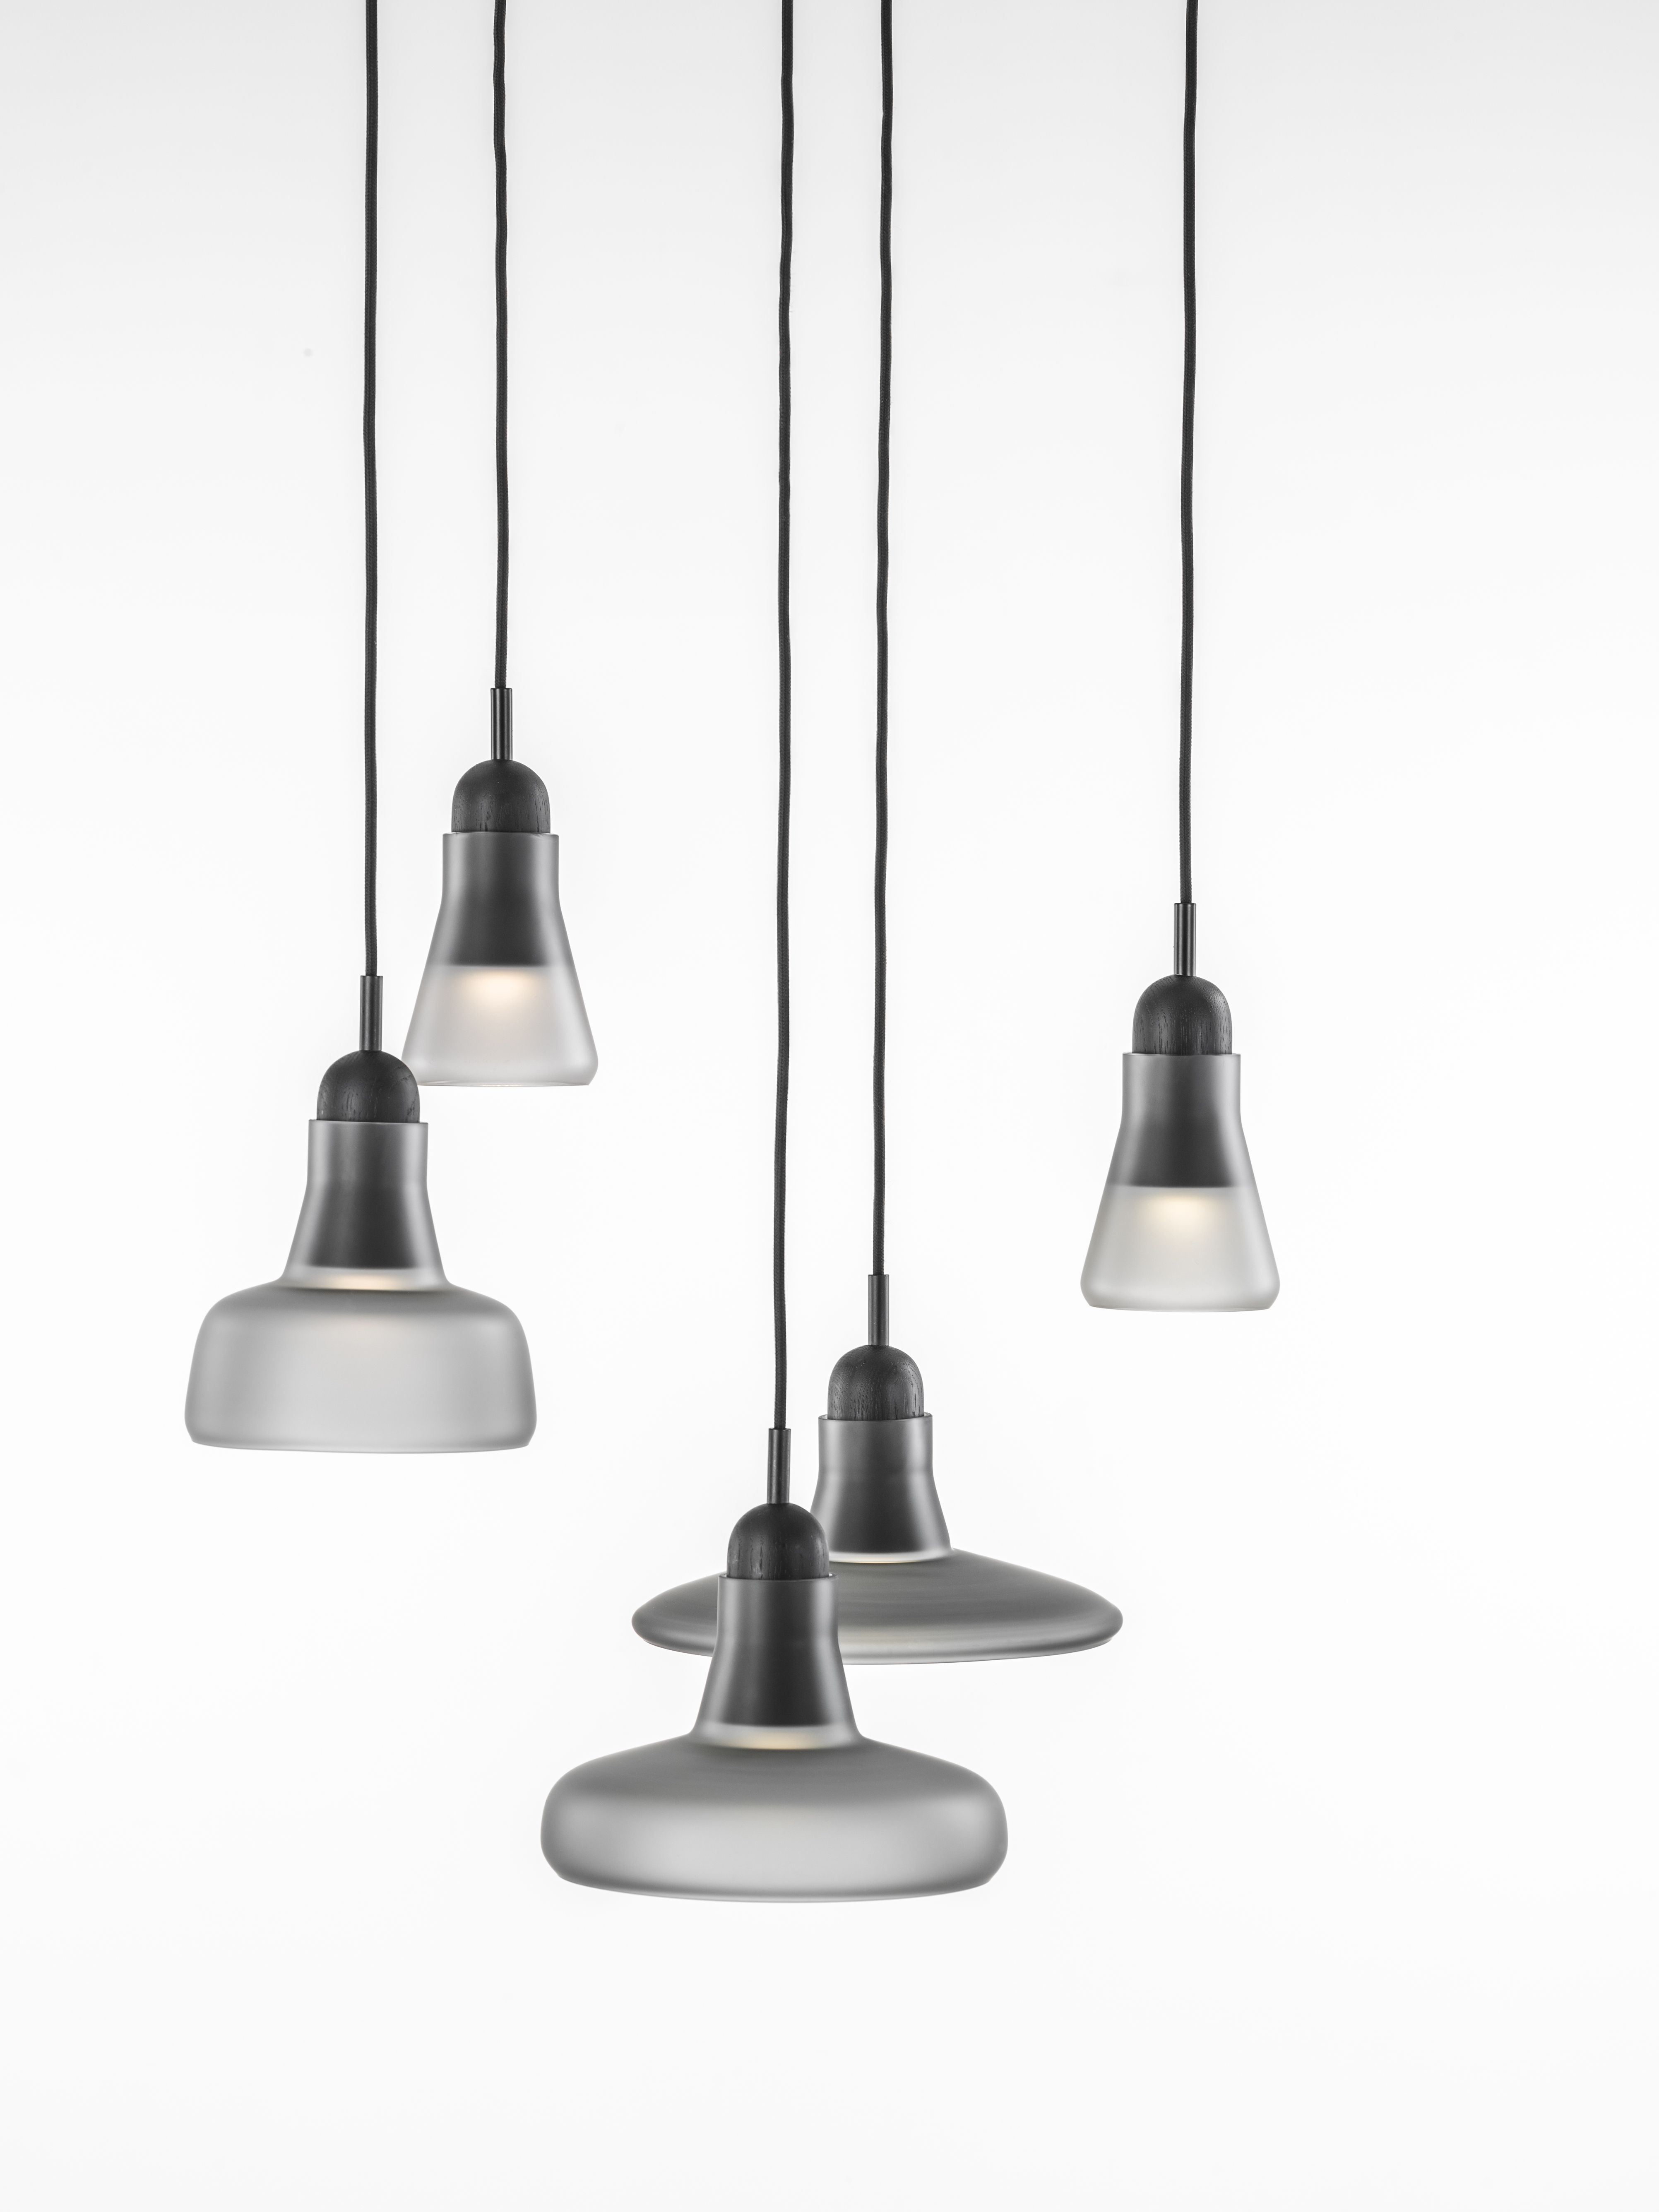 Dan Yeffet & Lucie Koldova white interior - brokis lights - grey mat shadows are